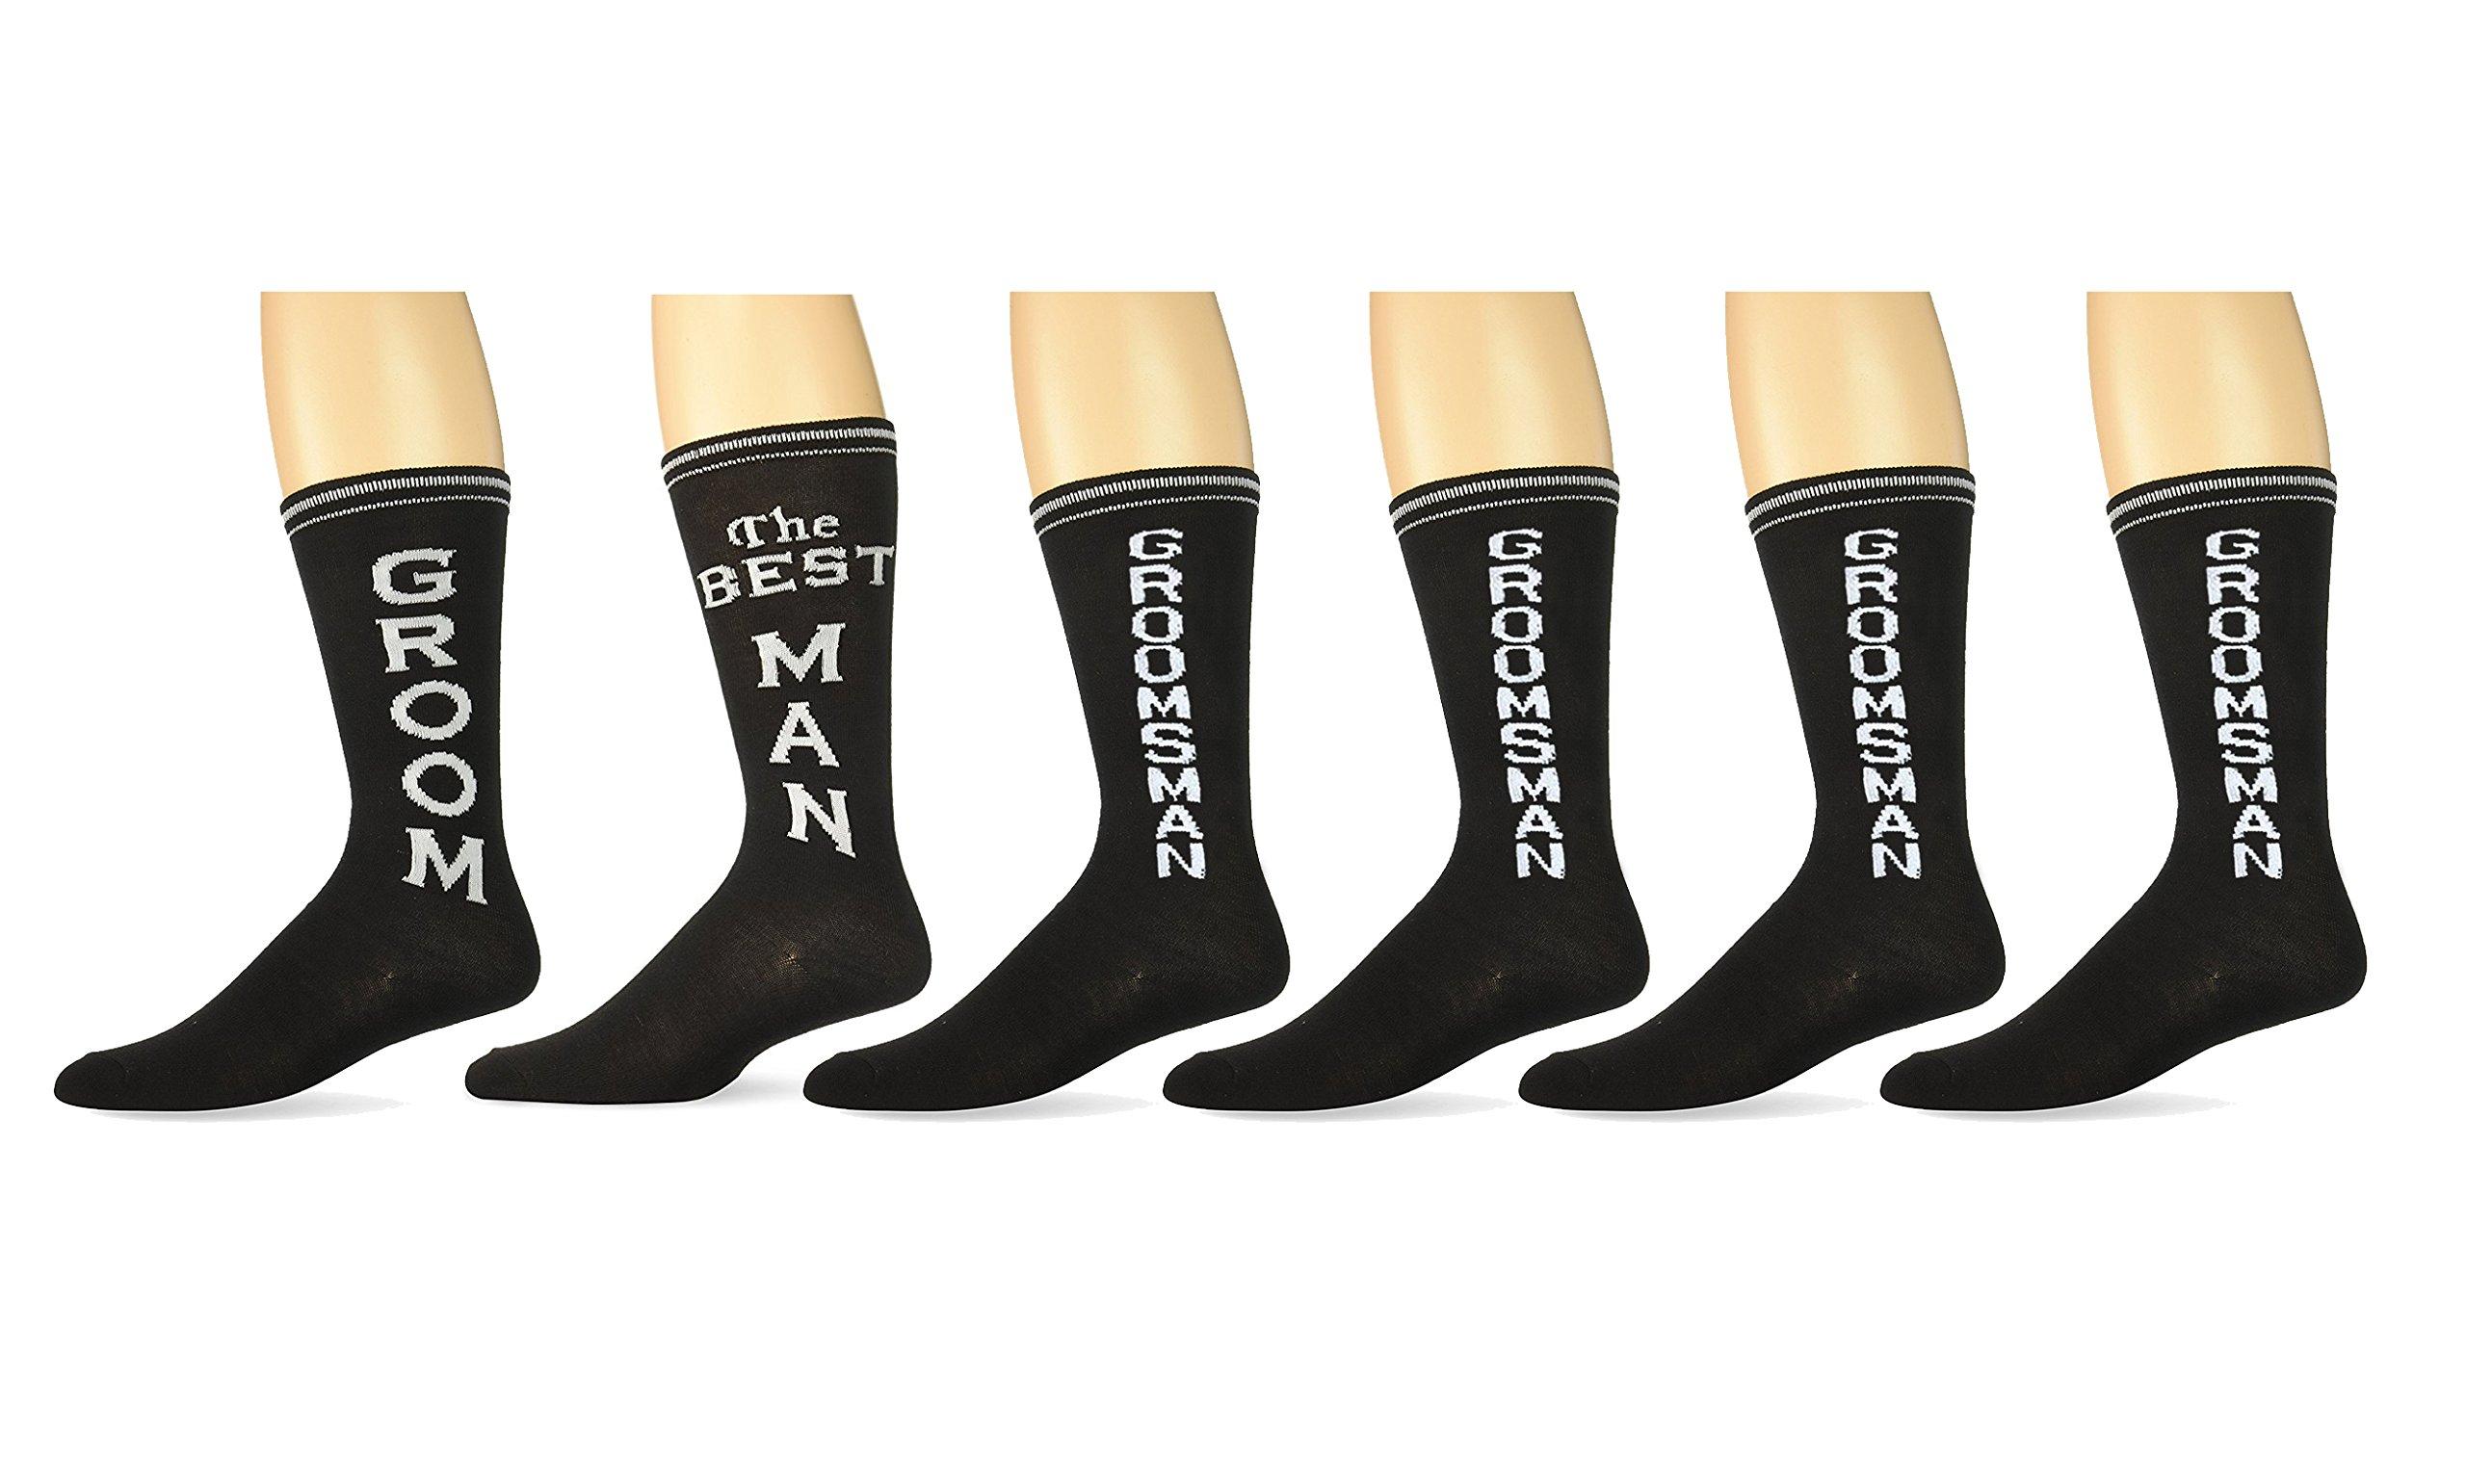 Mens Black Wedding Day Socks- Groom The Best Man and Groomsman Set  sc 1 st  Amazon.com & Menu0027s Groomsmen Gifts: Amazon.com